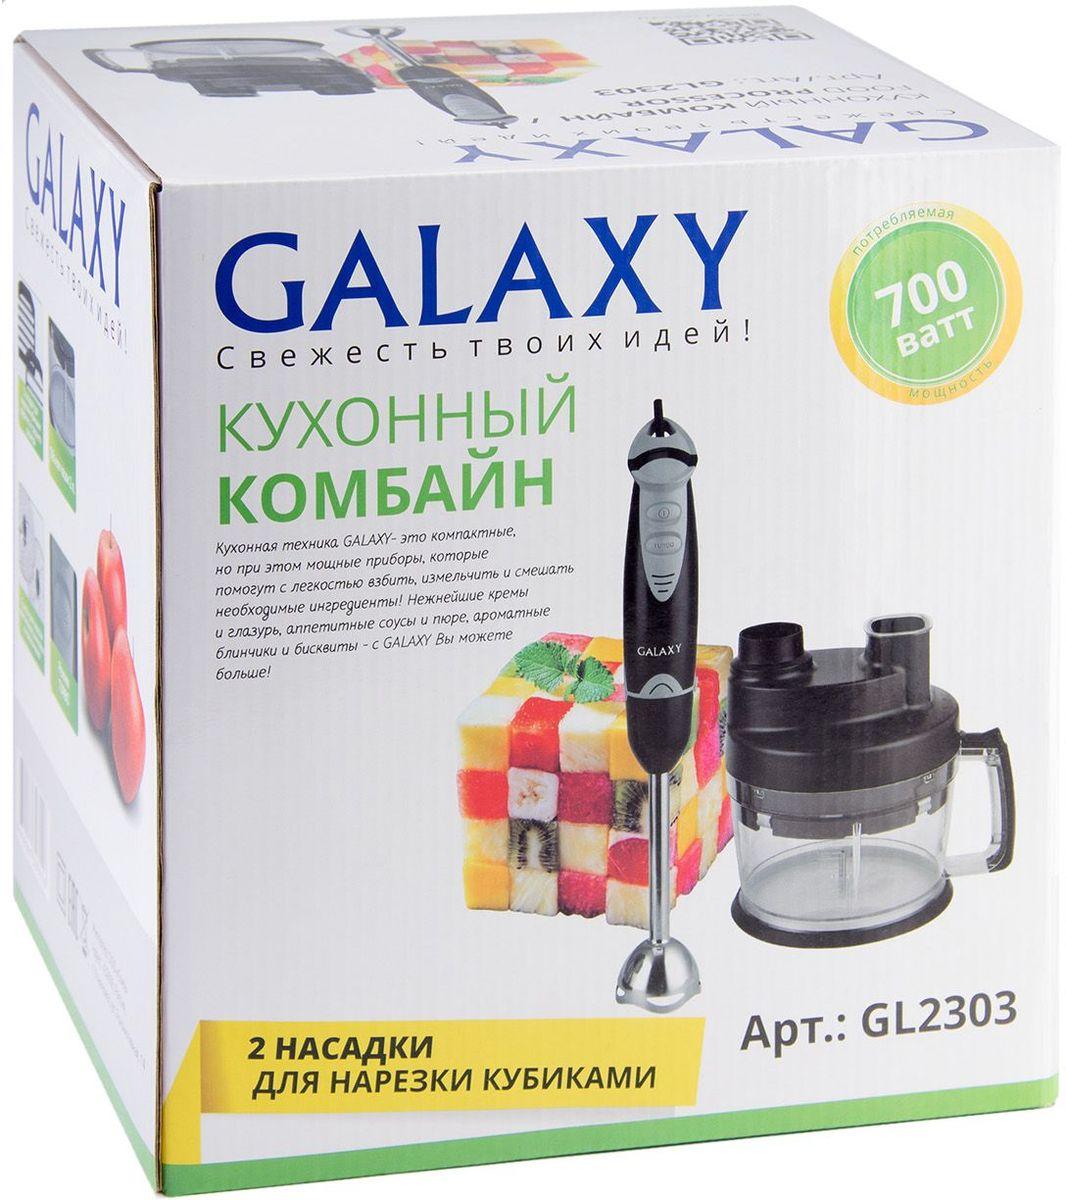 Кухонный комбайн Galaxy GL 2303, Black Galaxy